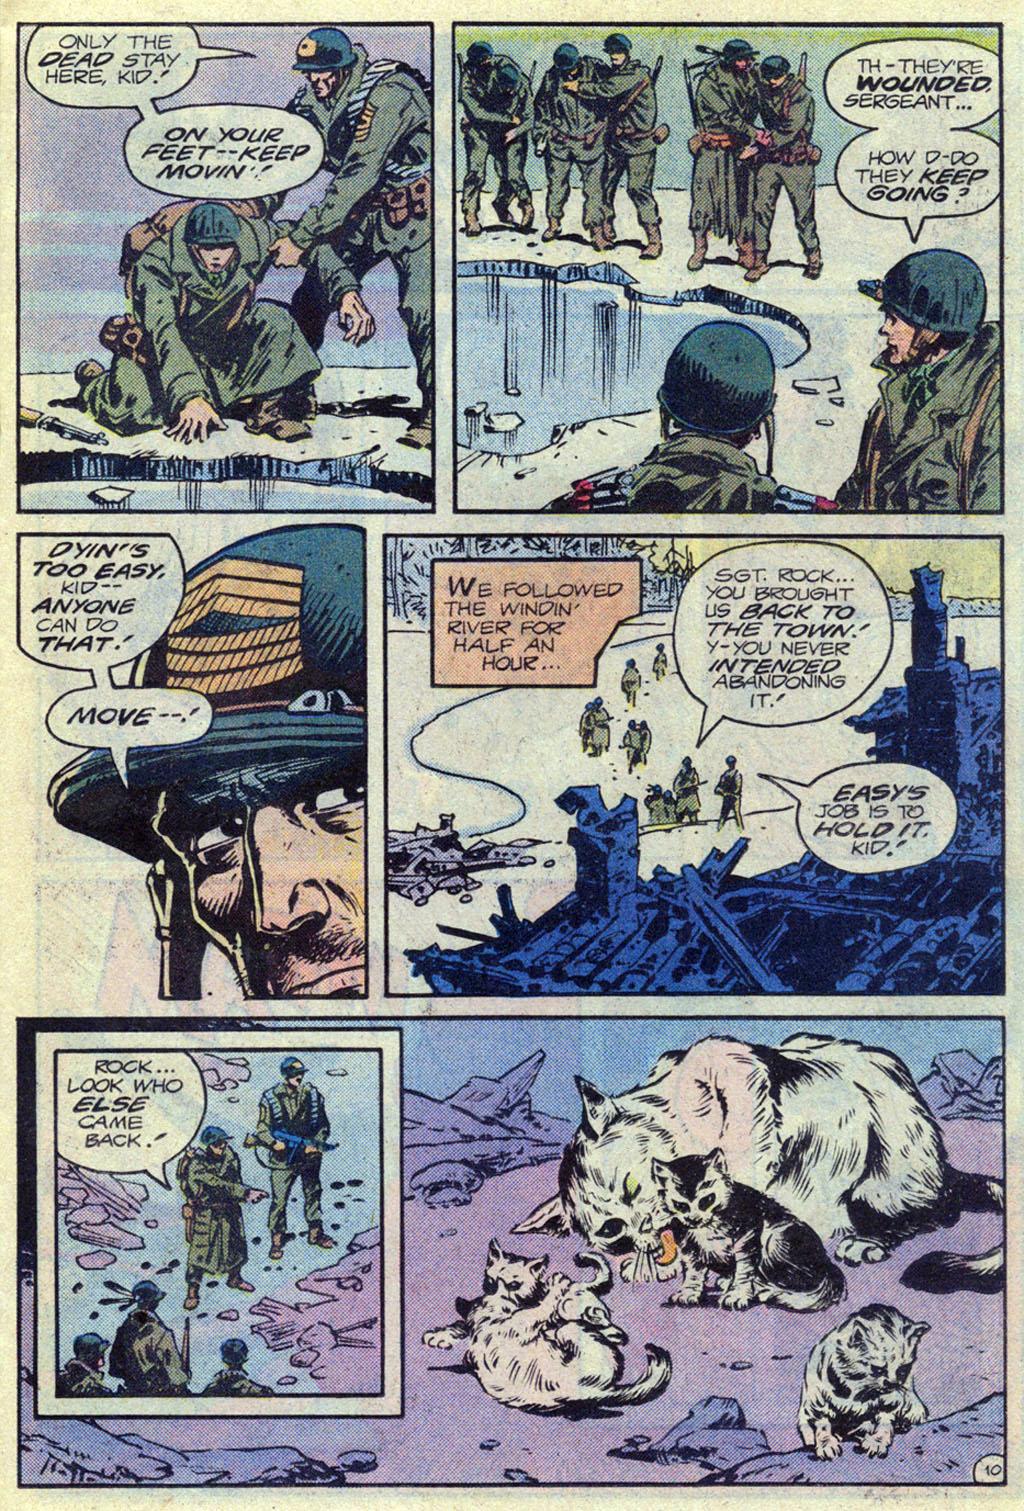 Read online Sgt. Rock comic -  Issue #369 - 10